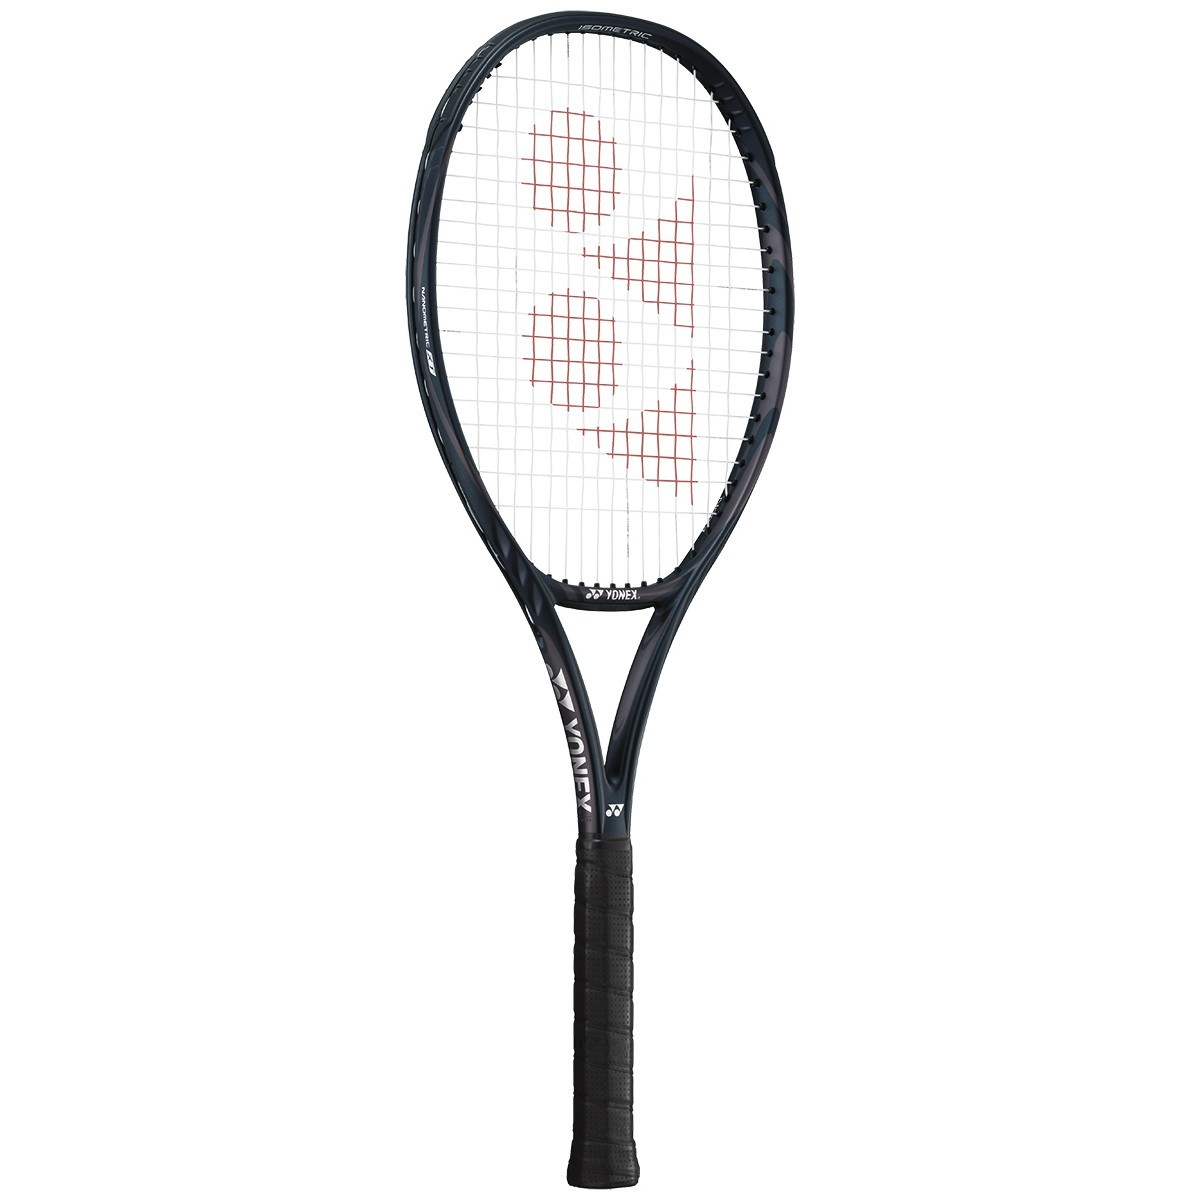 Rakieta tenisowa Yonex VCORE 100 Galaxy Black (300g) + naciąg